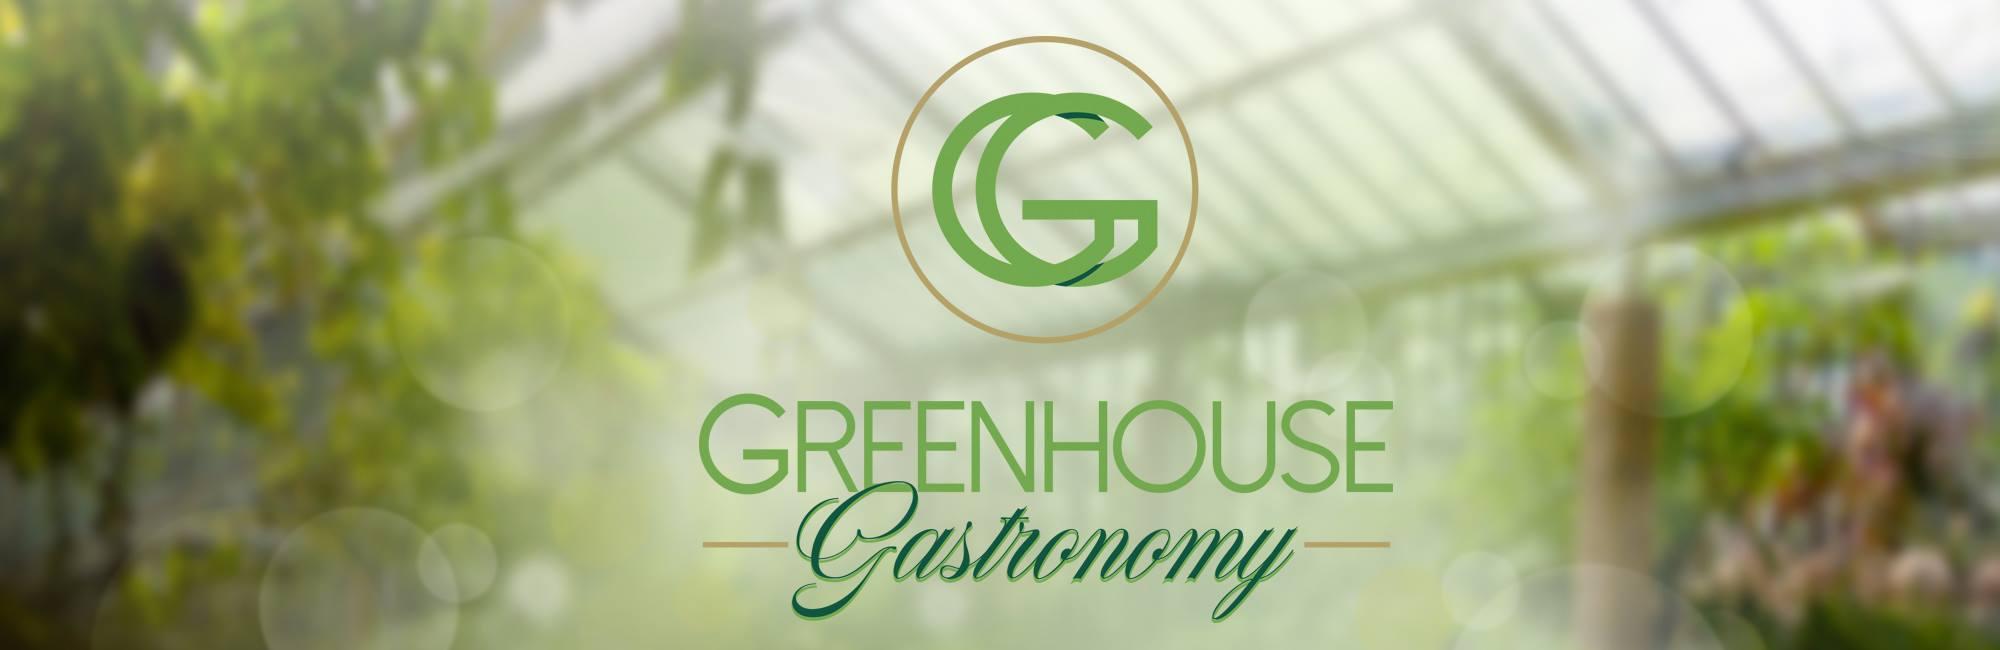 Greenhouse Gastronomy